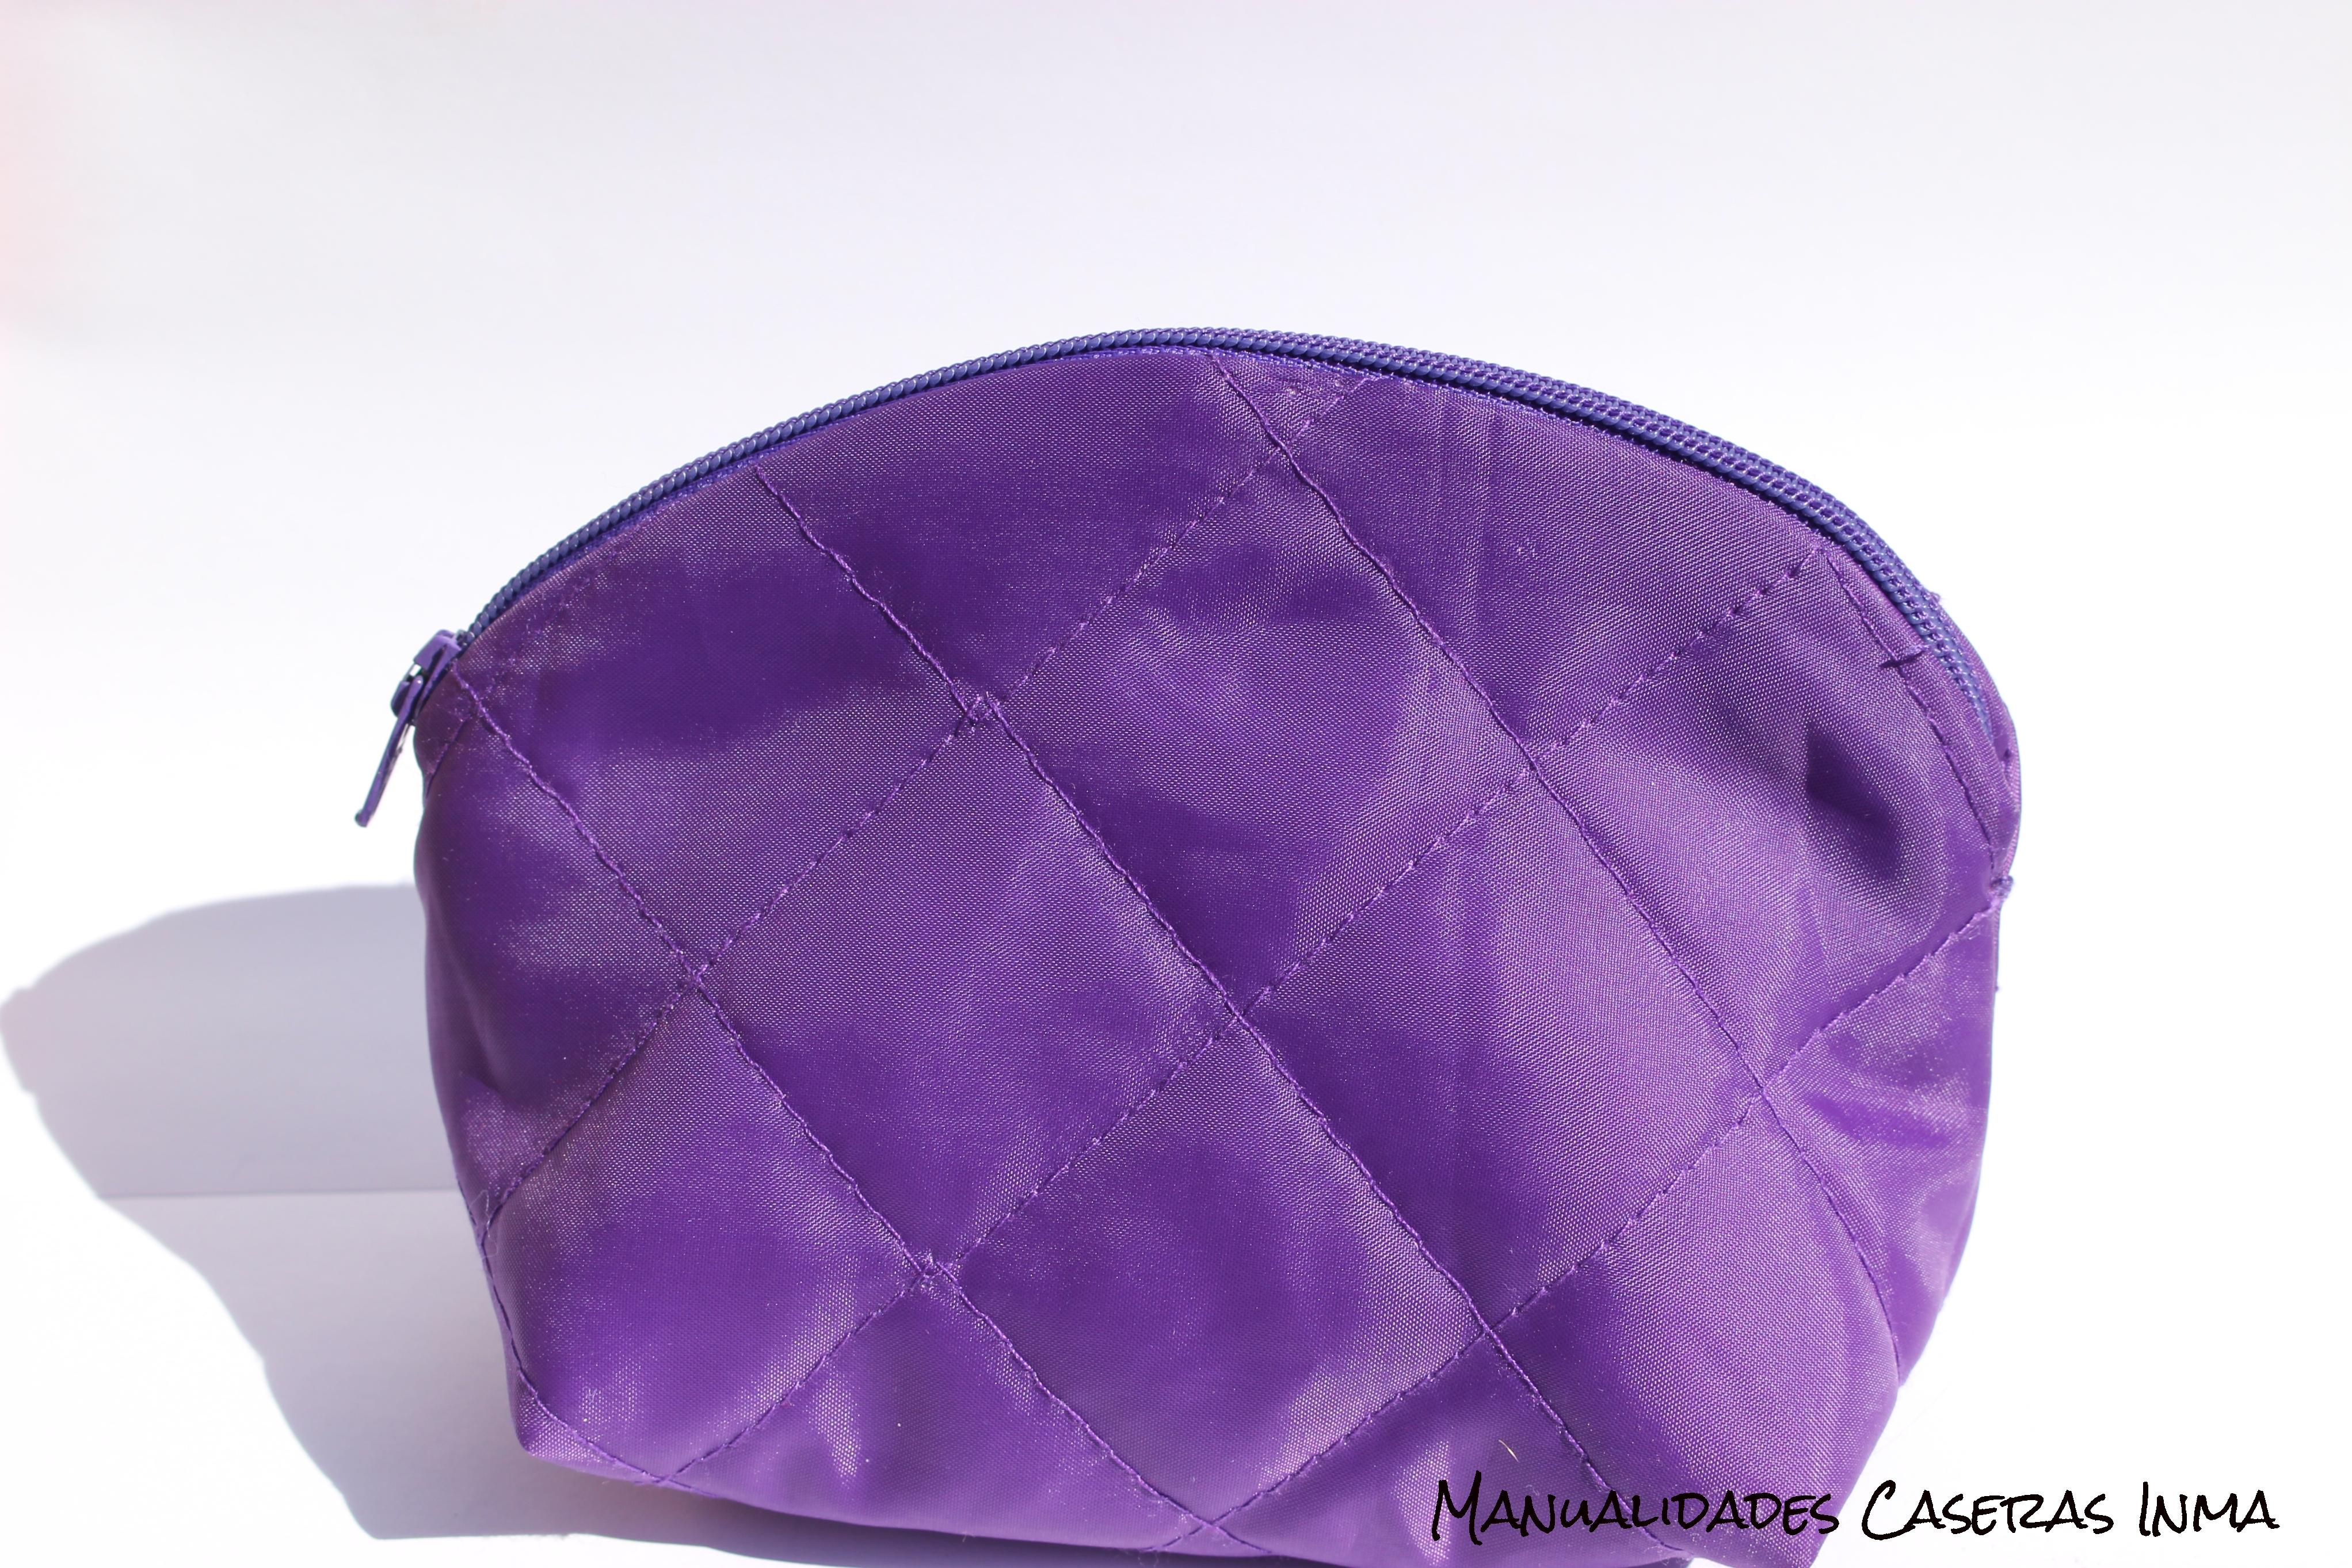 Manualidades Caseras Inma_ Neceser Violeta con tela acolchada